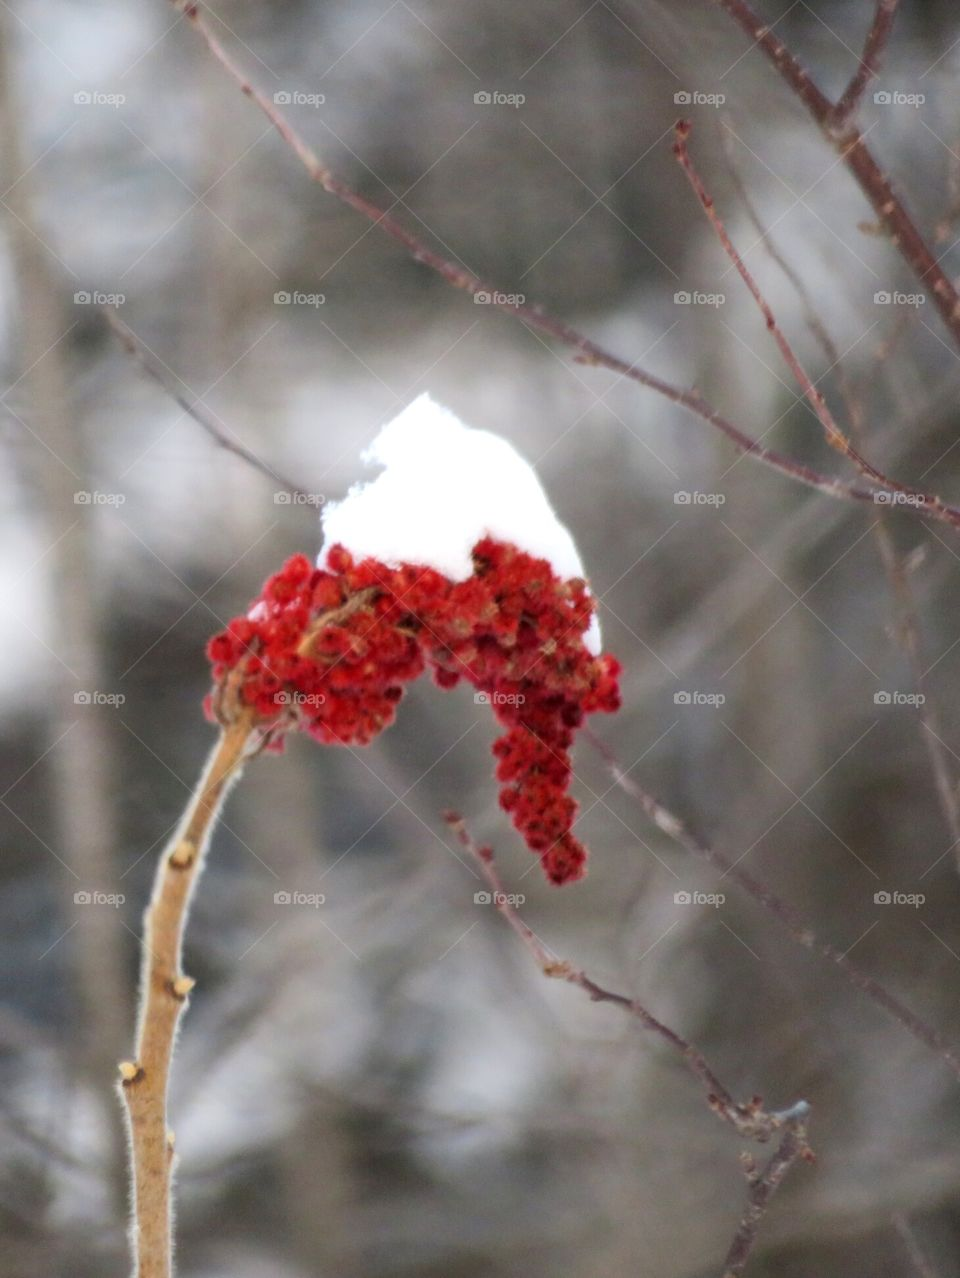 Snow-capped Berries